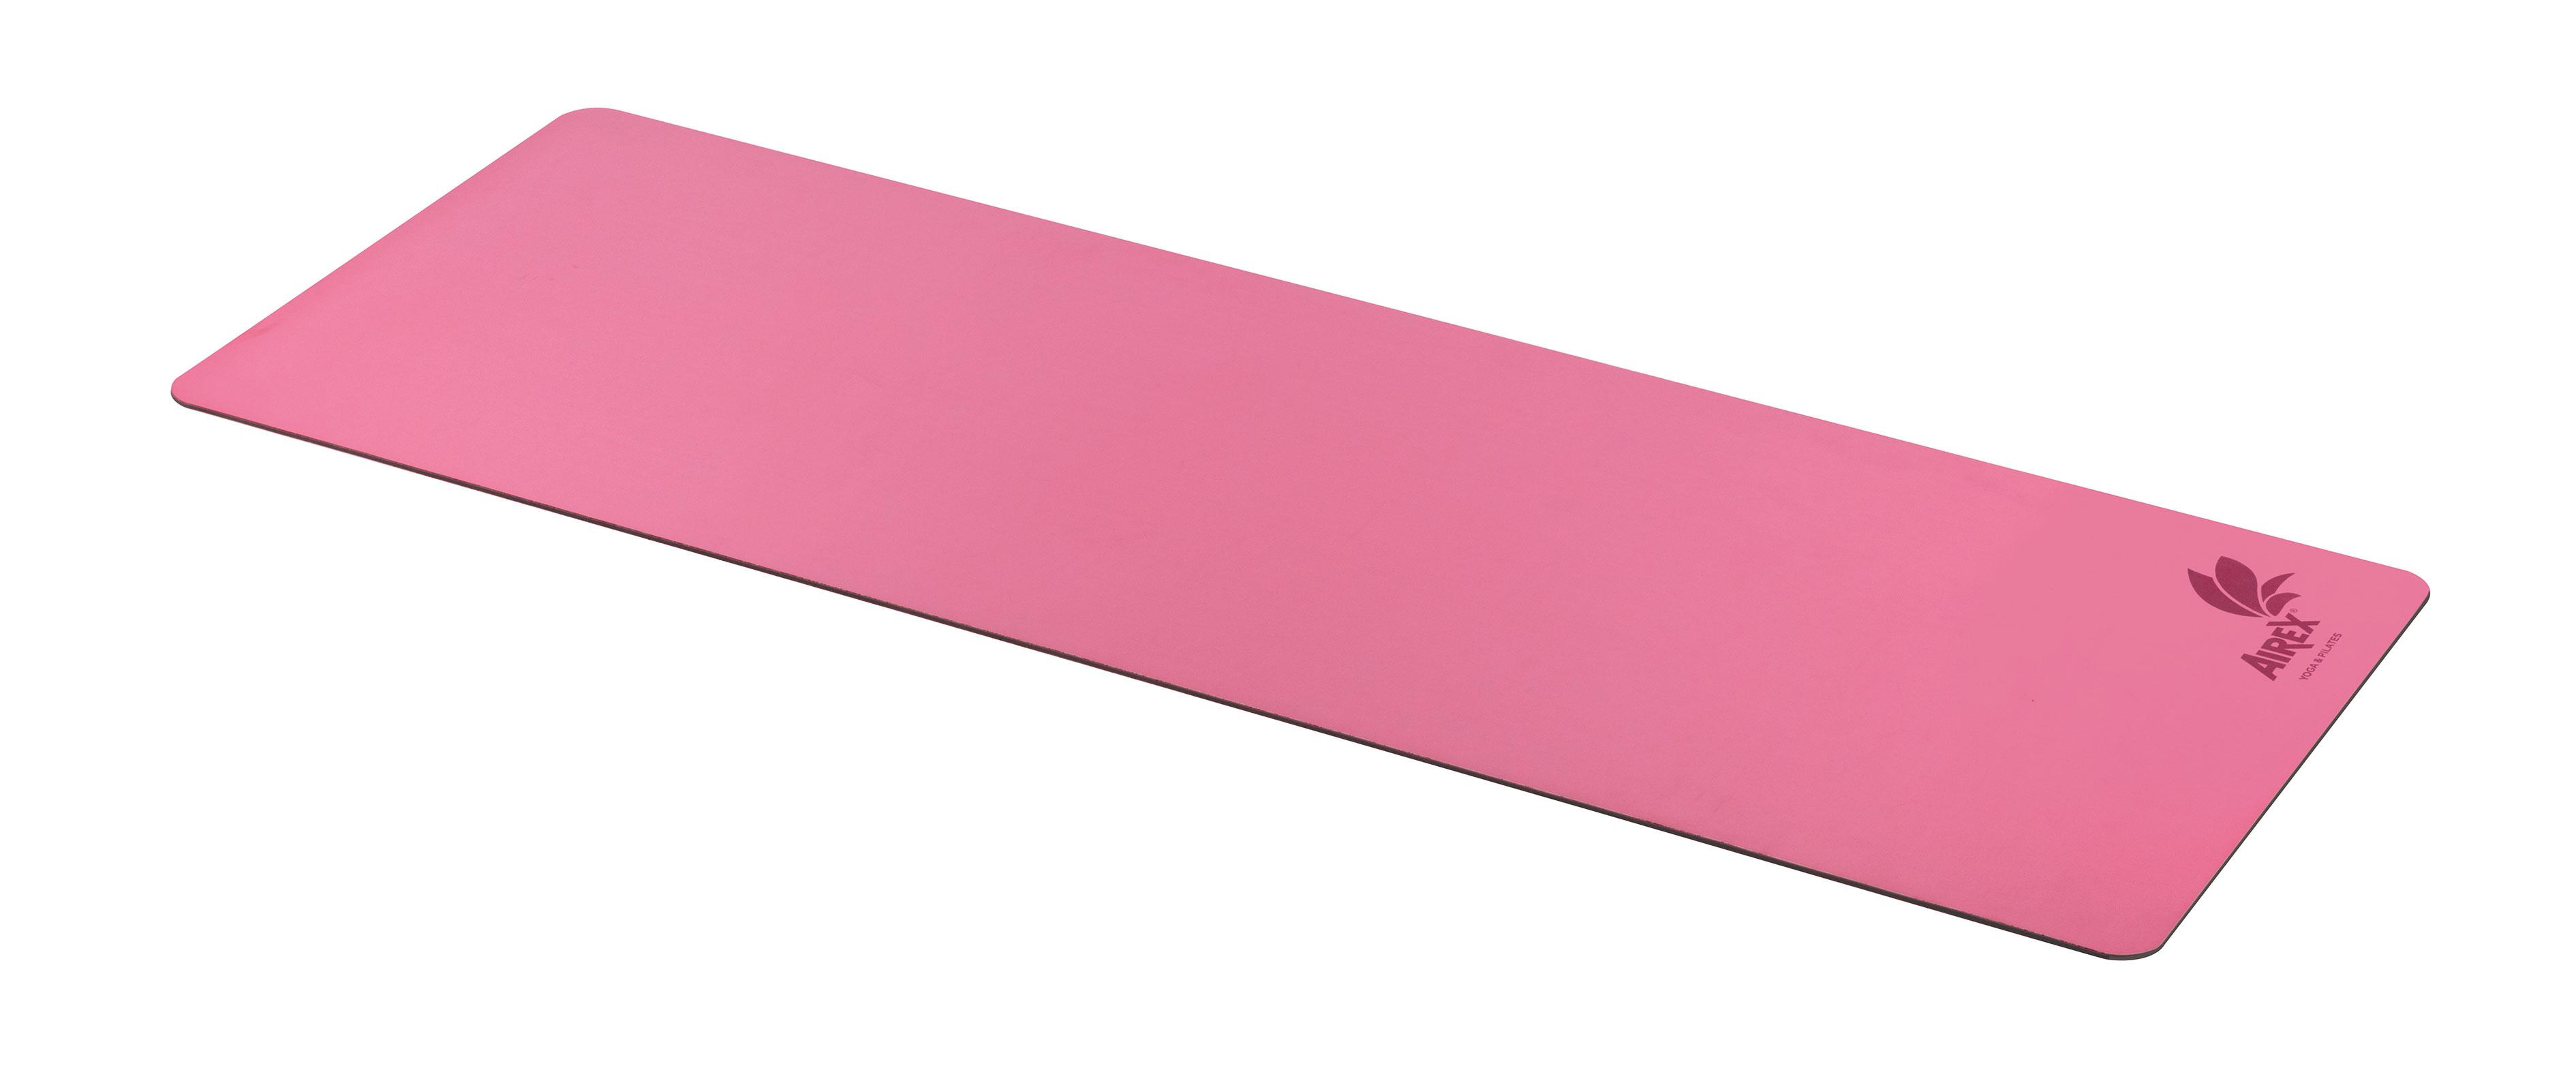 Yoga Eco Grip mat